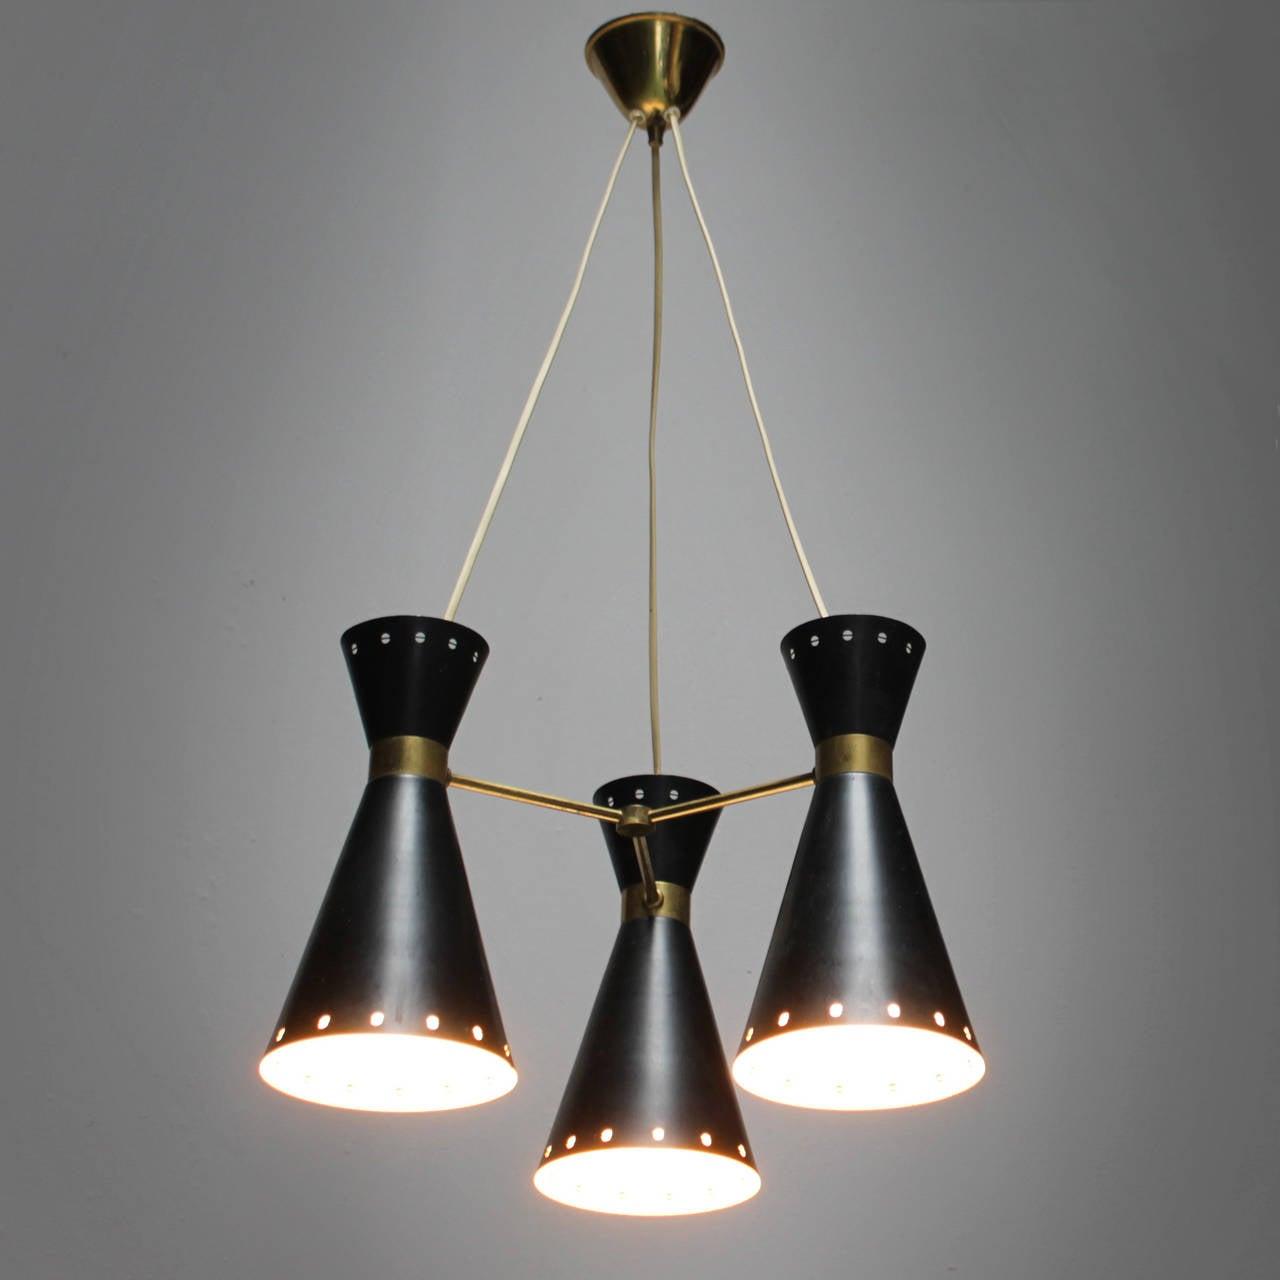 Three Light Swedish Diabolo Pendant At 1stdibs